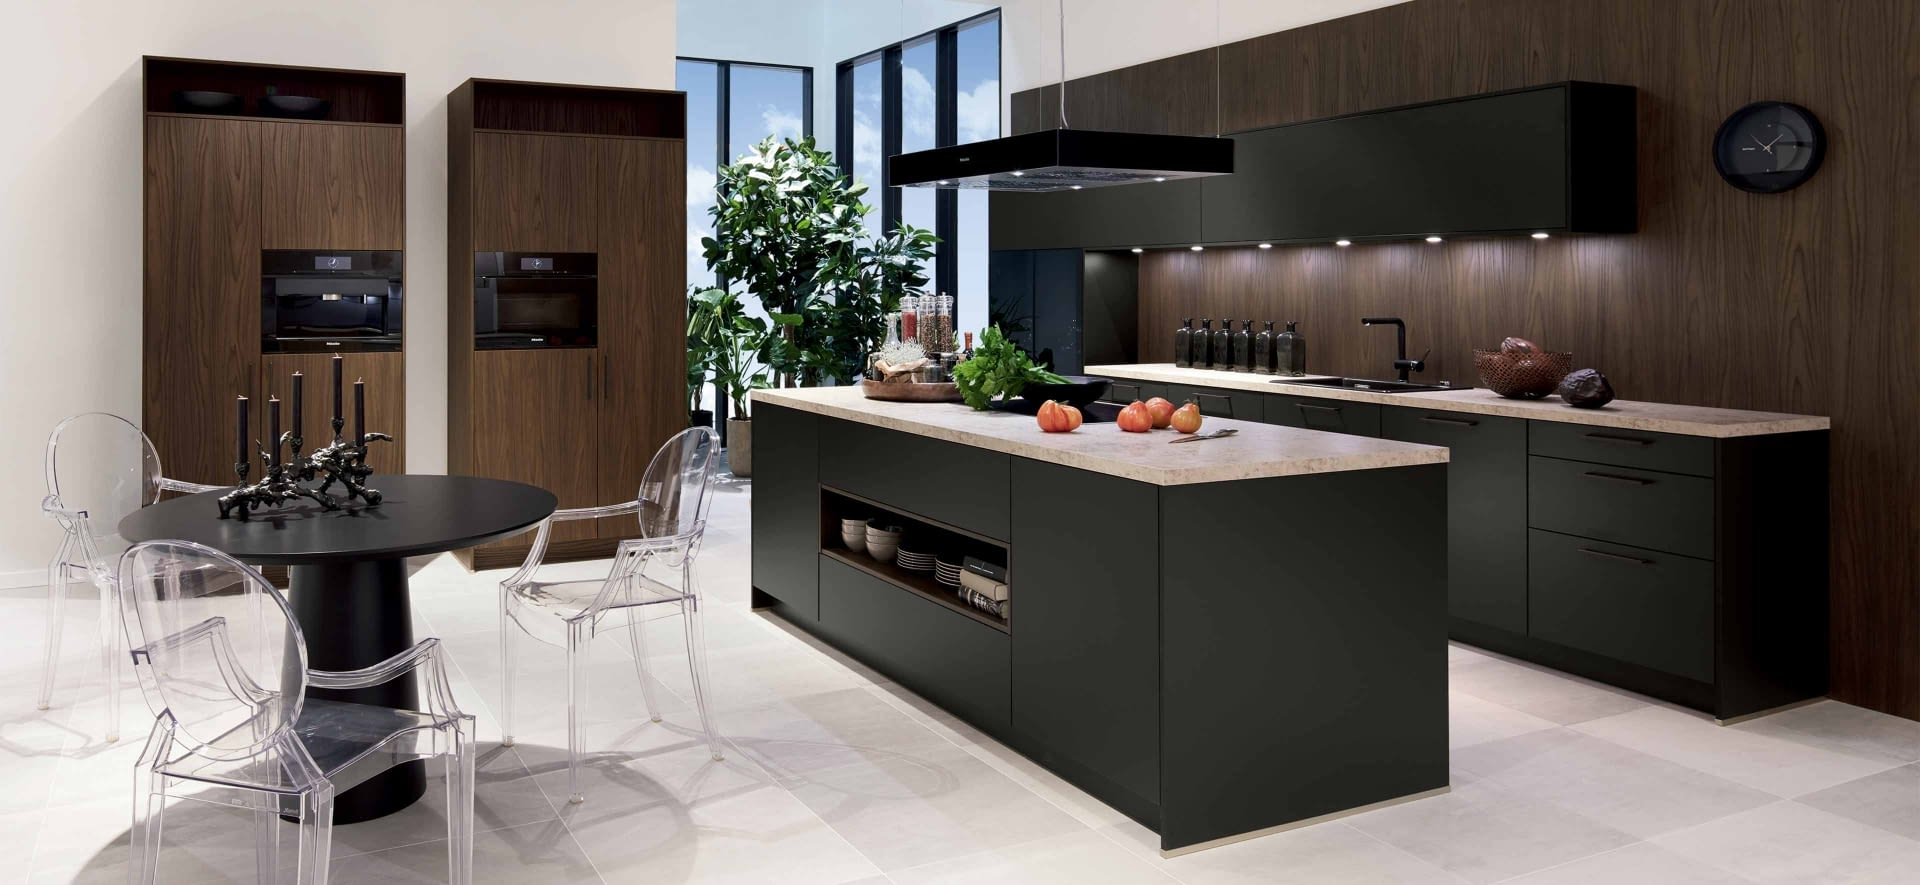 moderne k che havannaschwarz sherwood dunkelbraun marquardt k chen. Black Bedroom Furniture Sets. Home Design Ideas